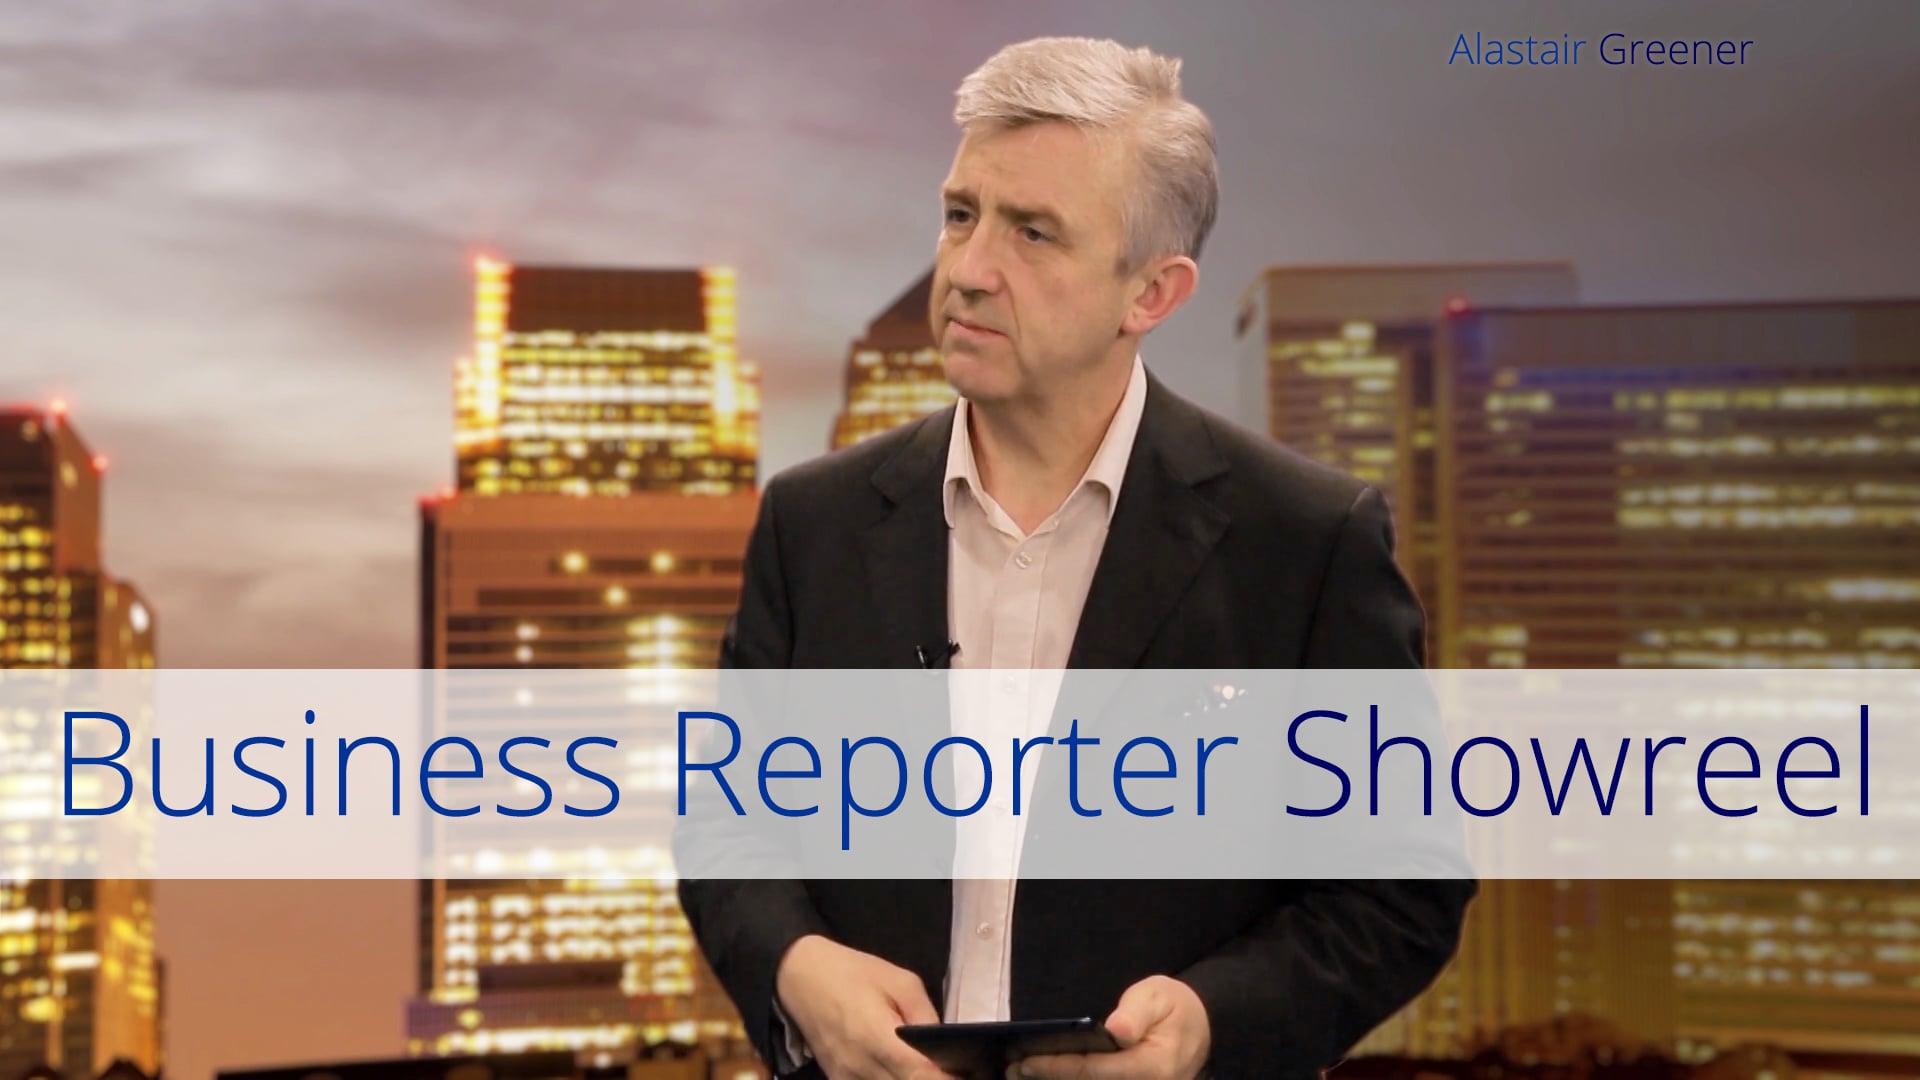 Alastair Greener - Business Reporter